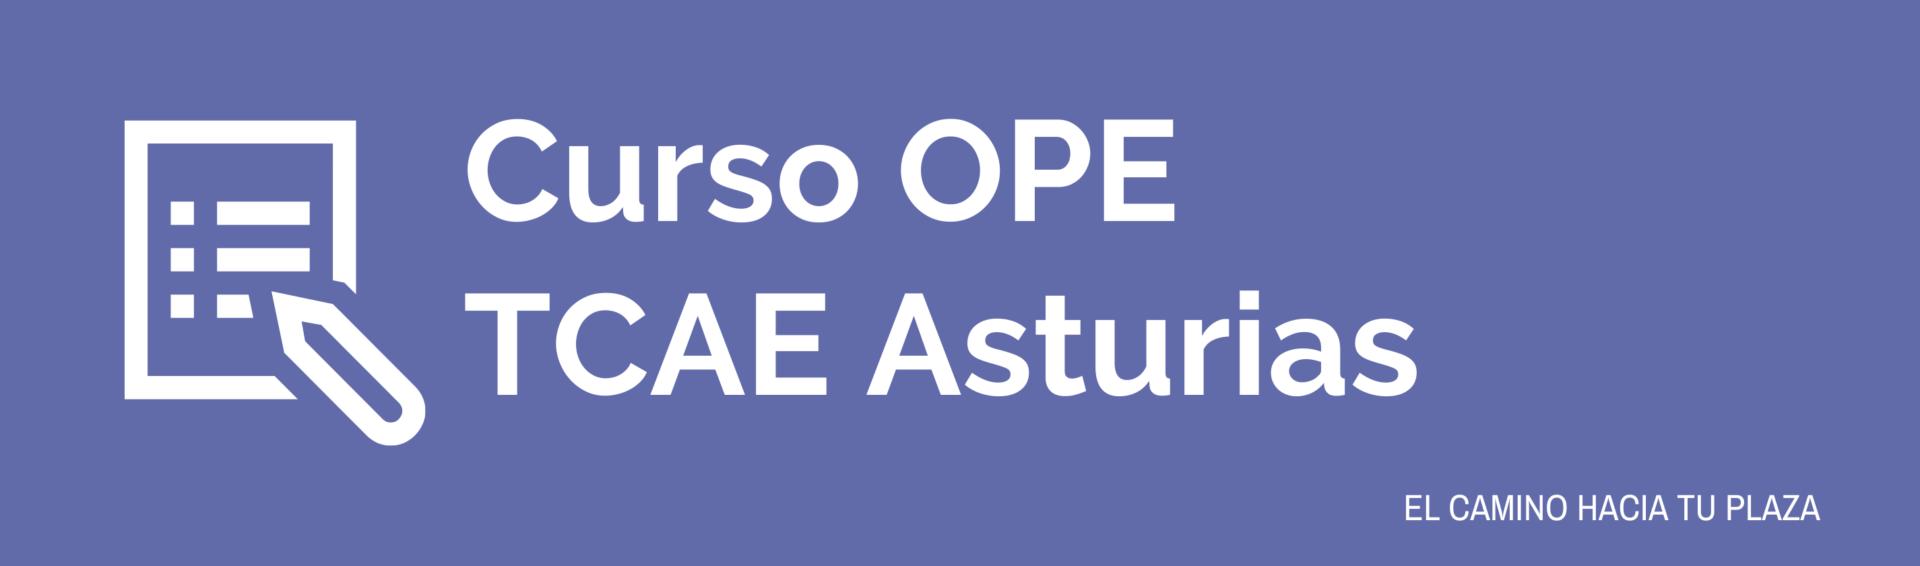 Curso OPE TCAE Asturias